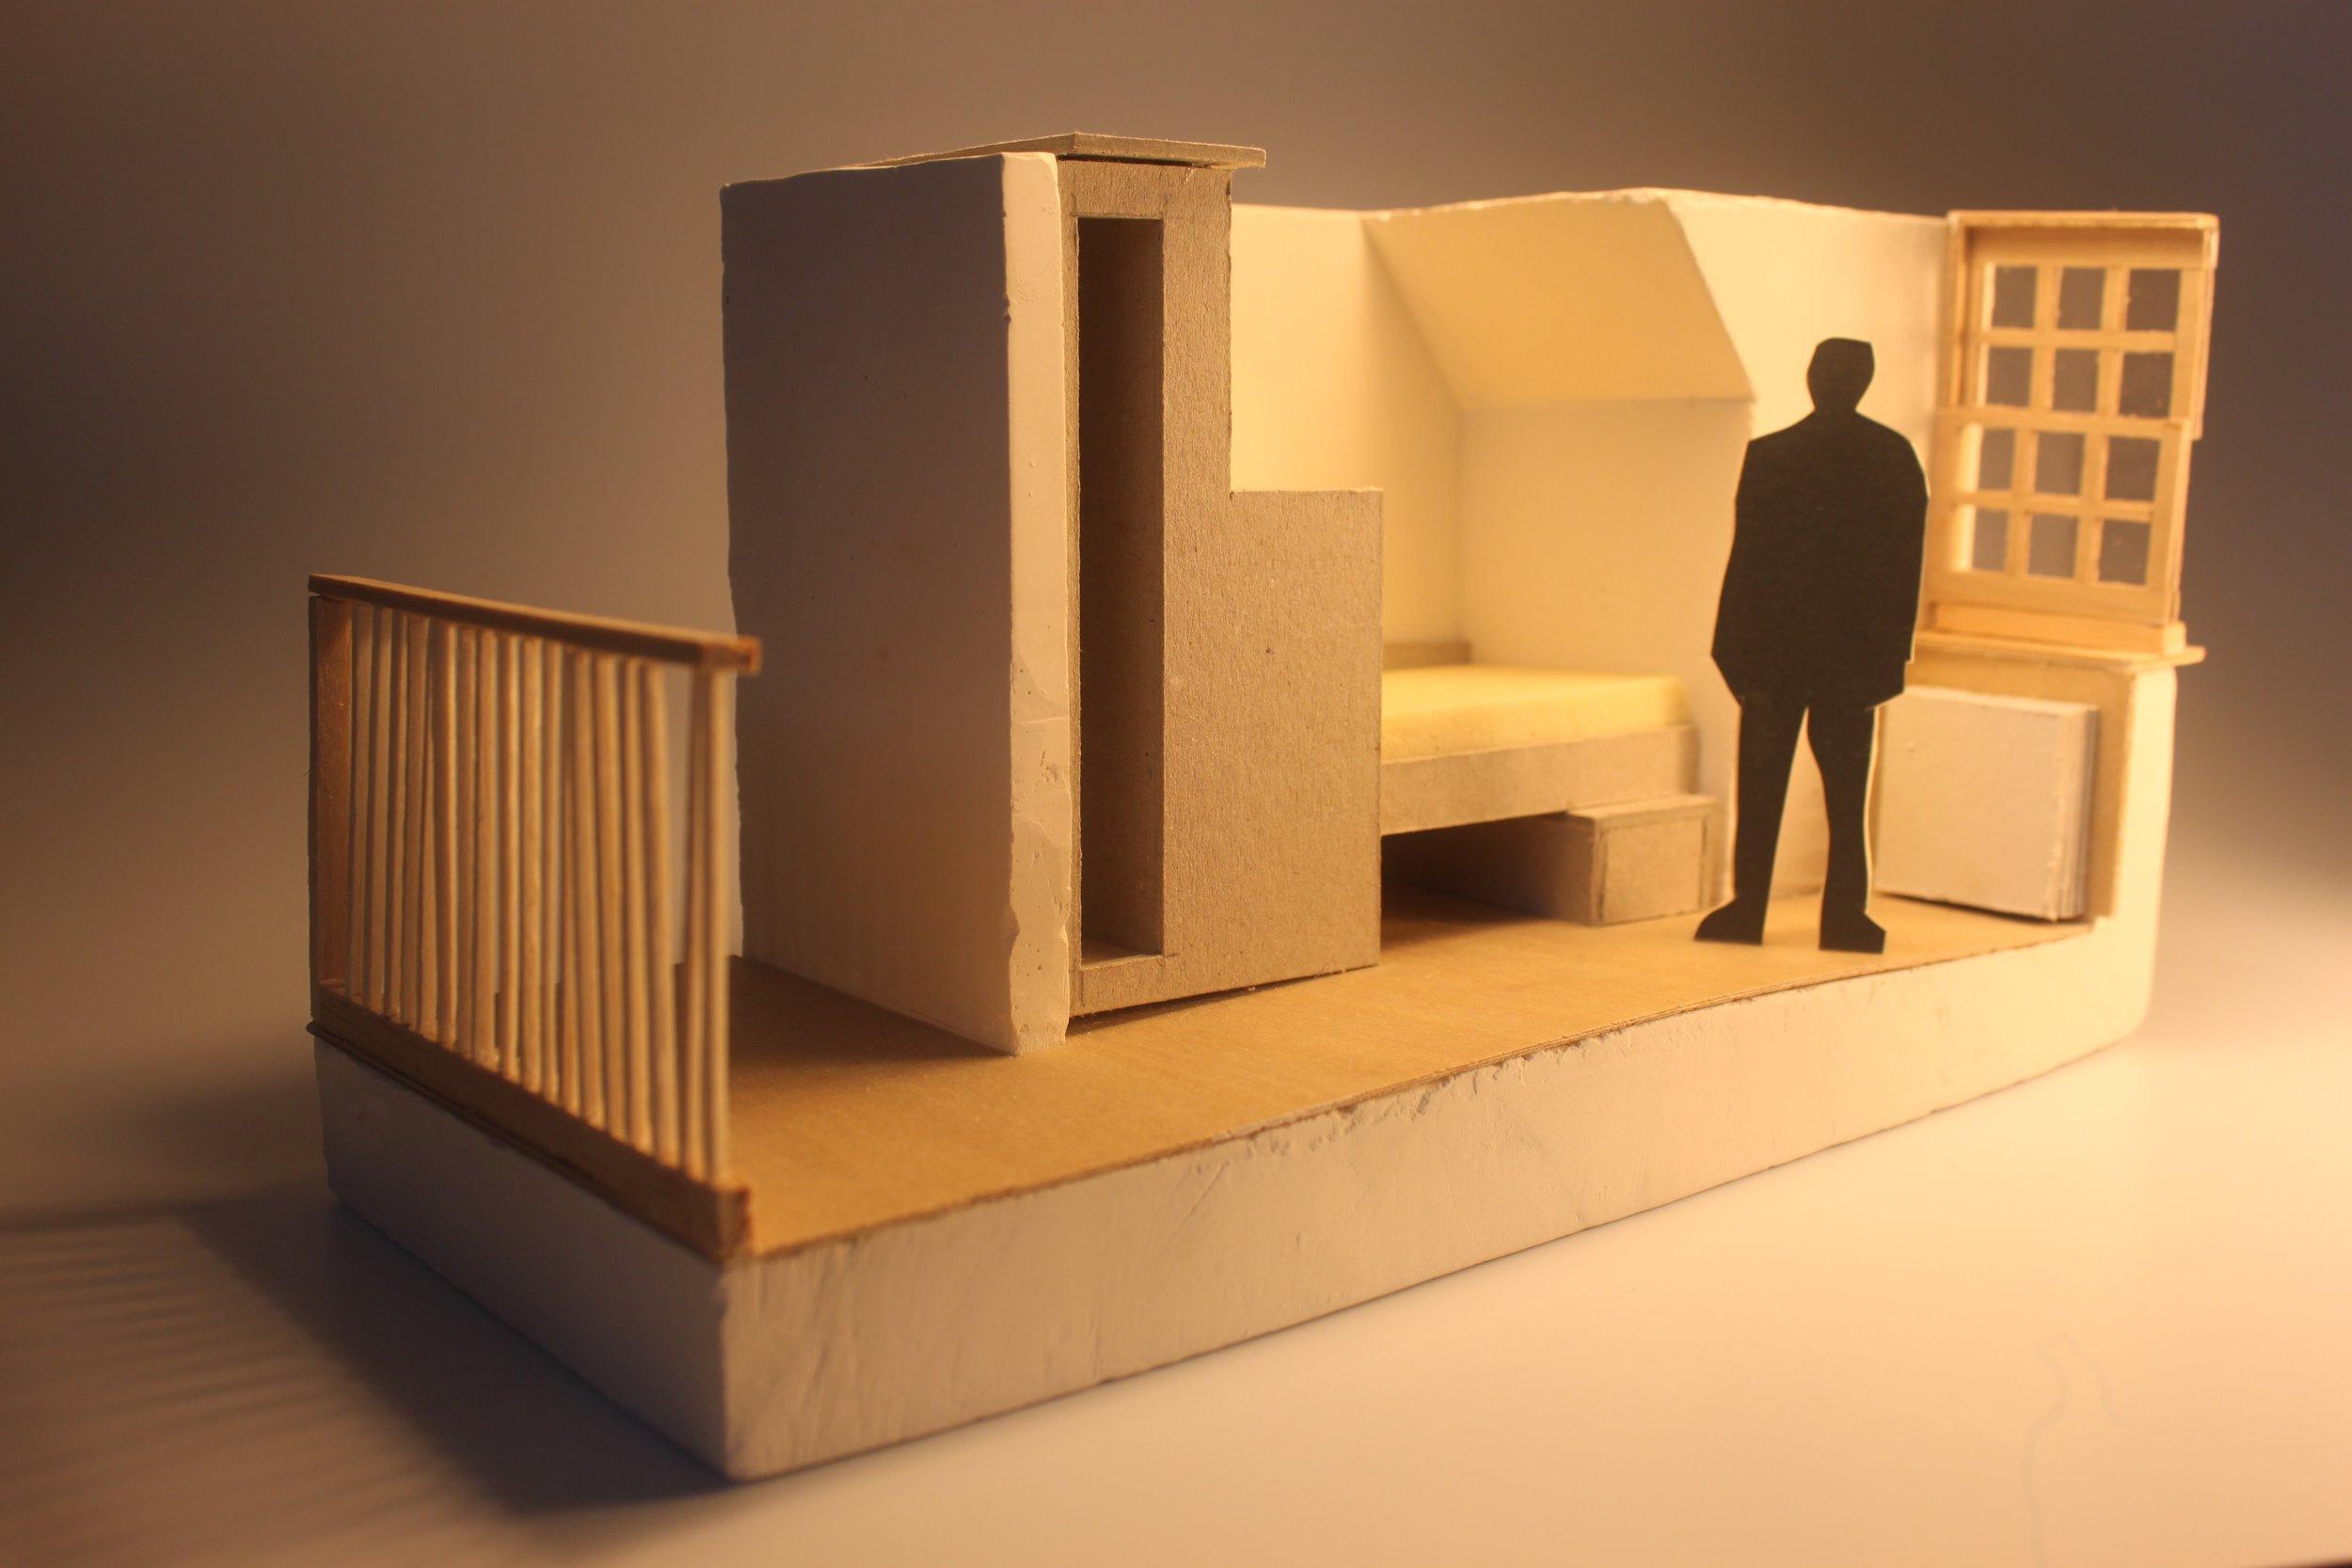 118 Bedroom Model Bed.jpg